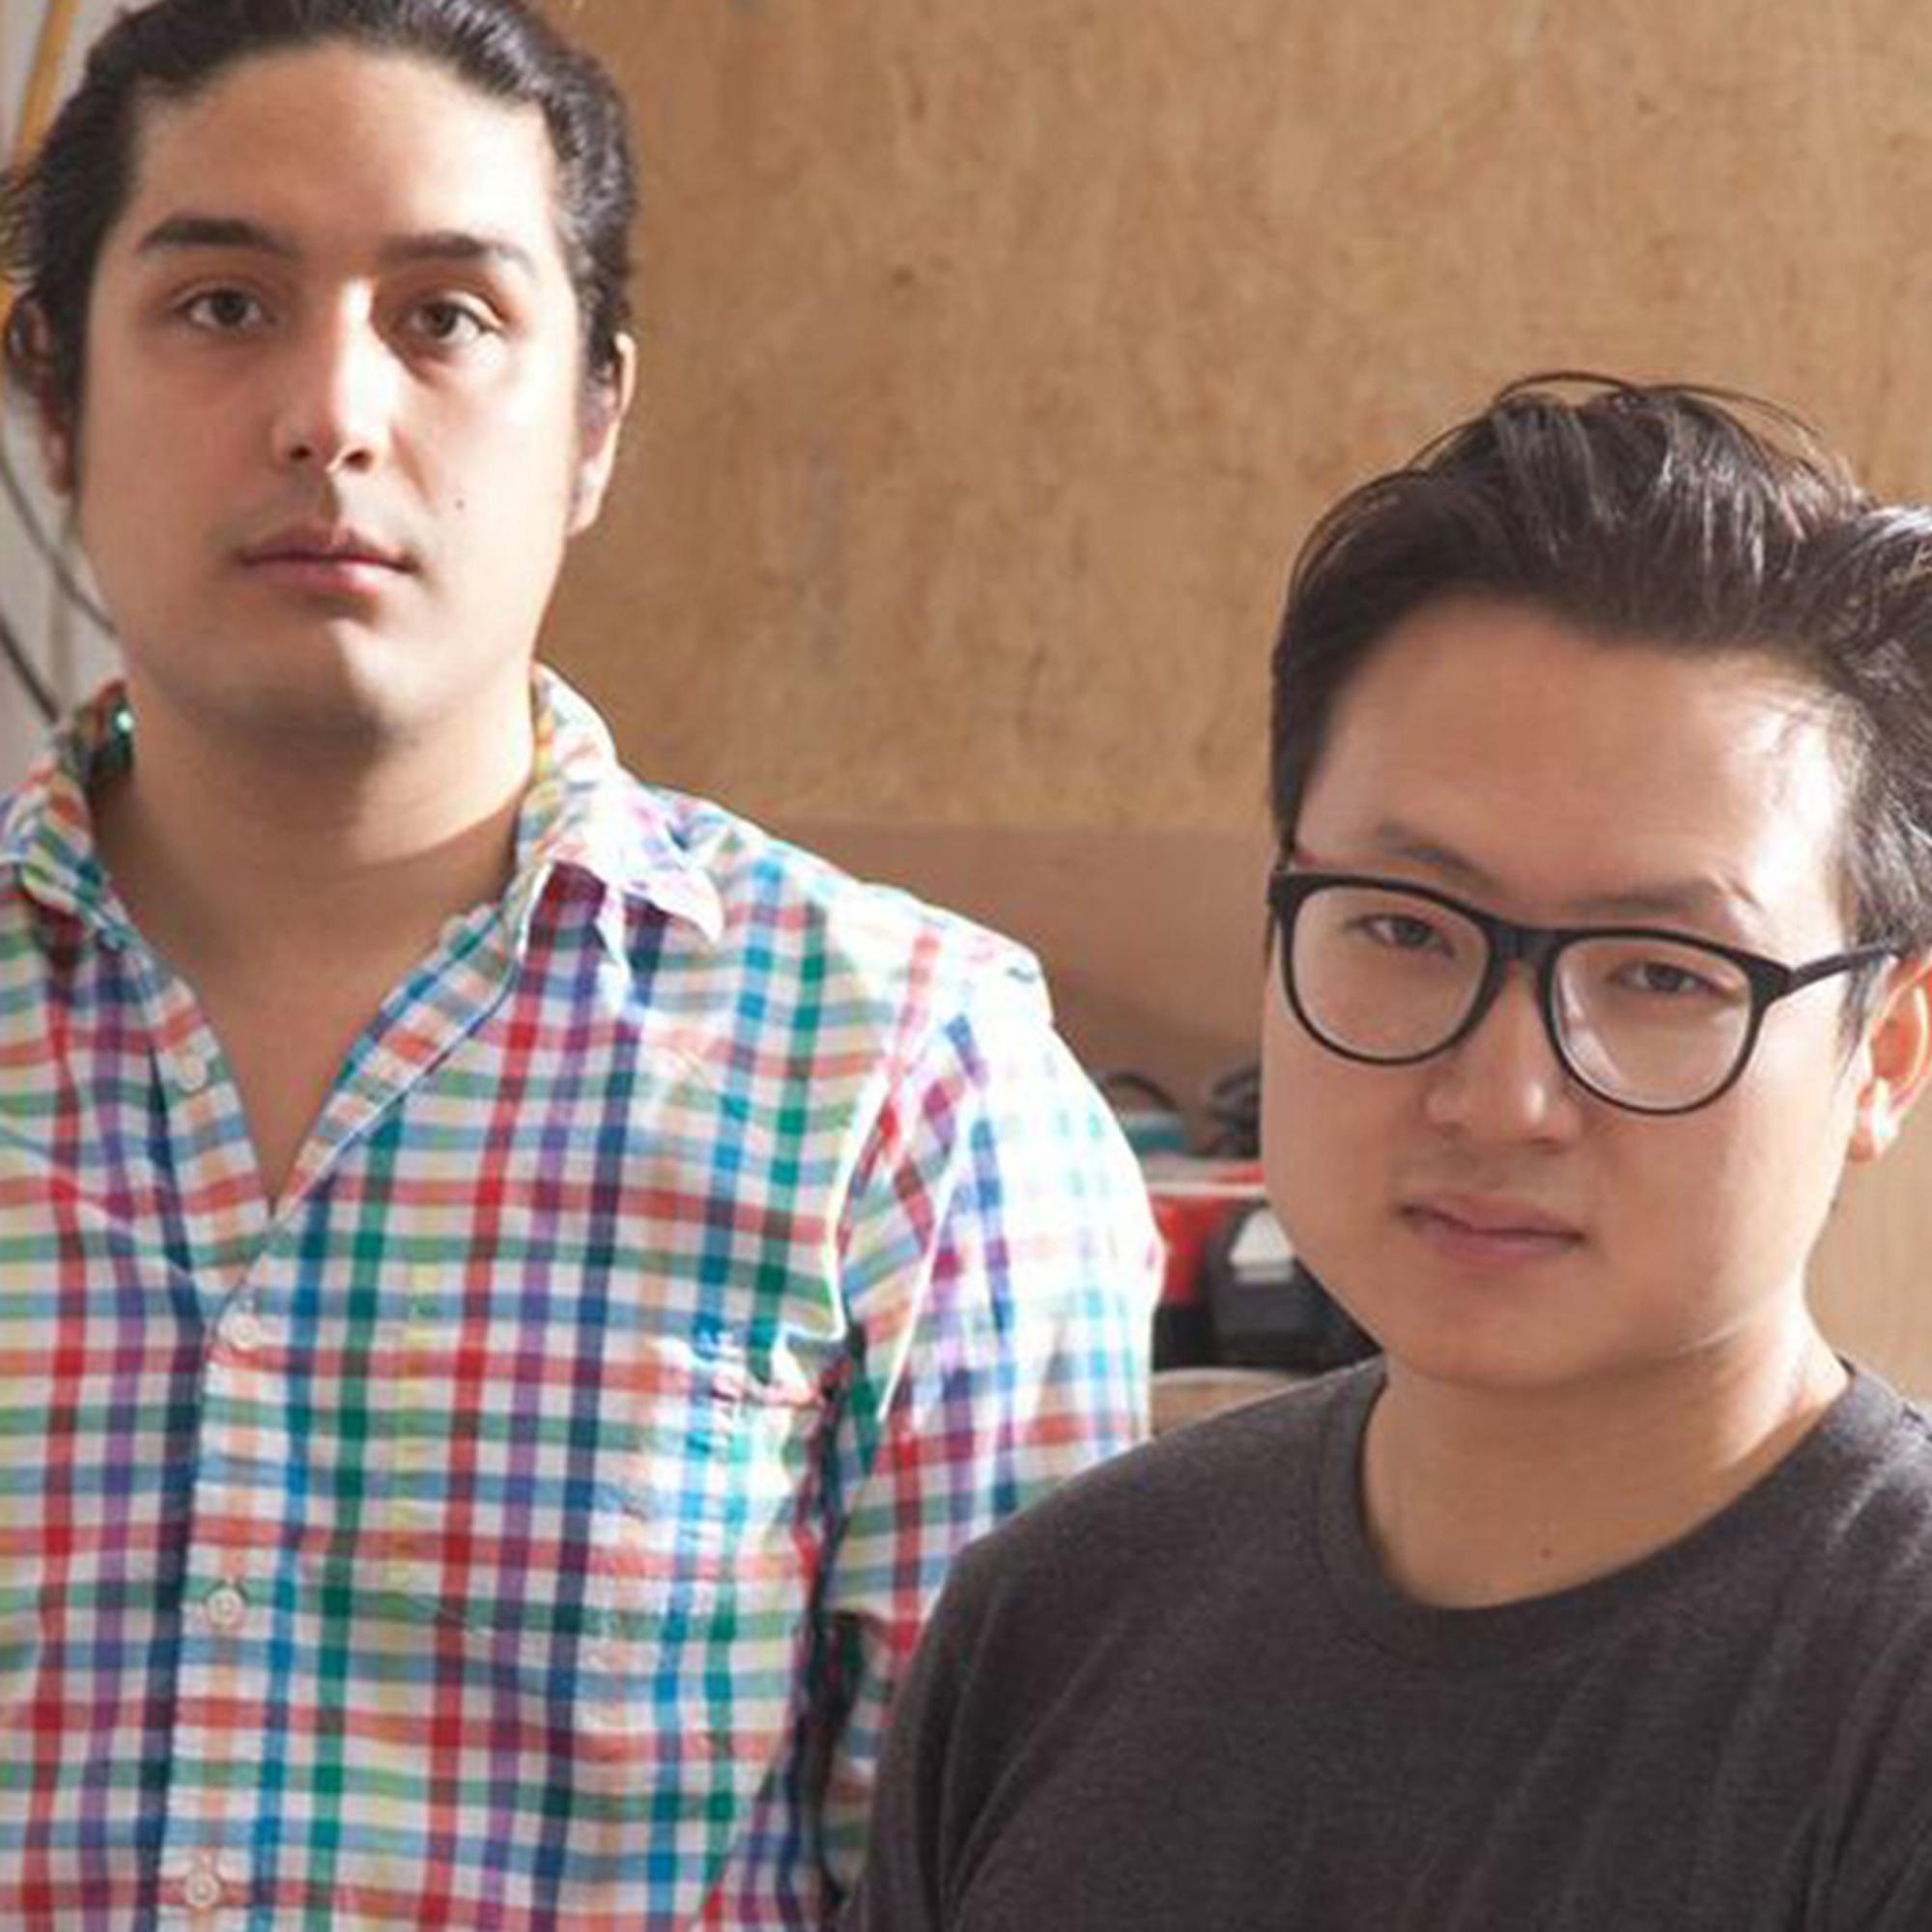 ChenChen&KaiWilliams_Portrait_resized.jpg